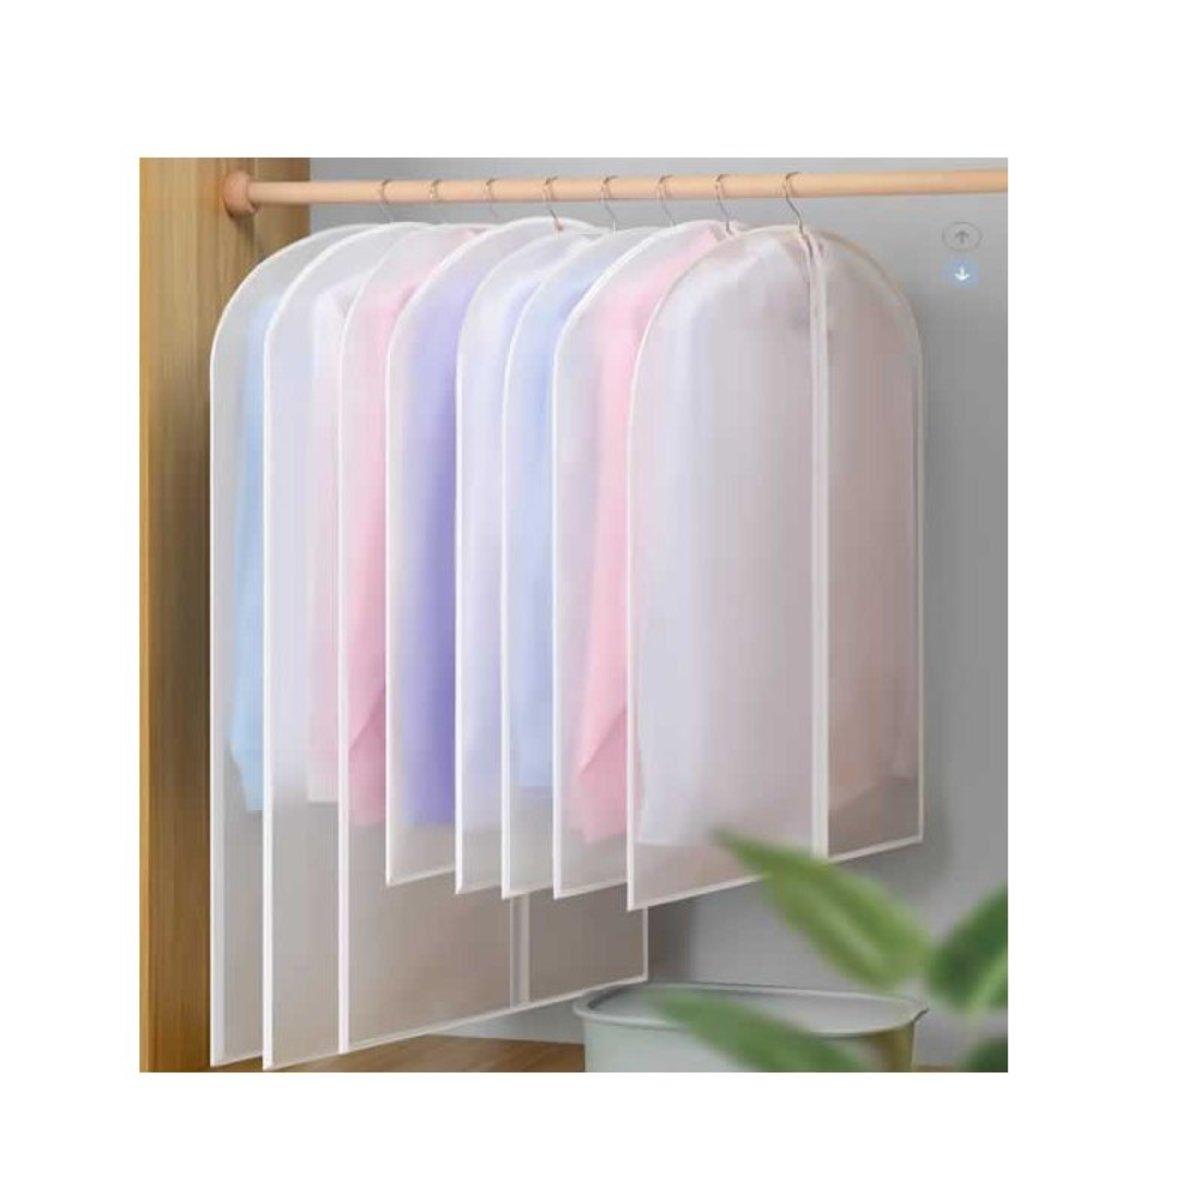 Translucent dustproof clothing bag (60cmX100cm)-10 pieces